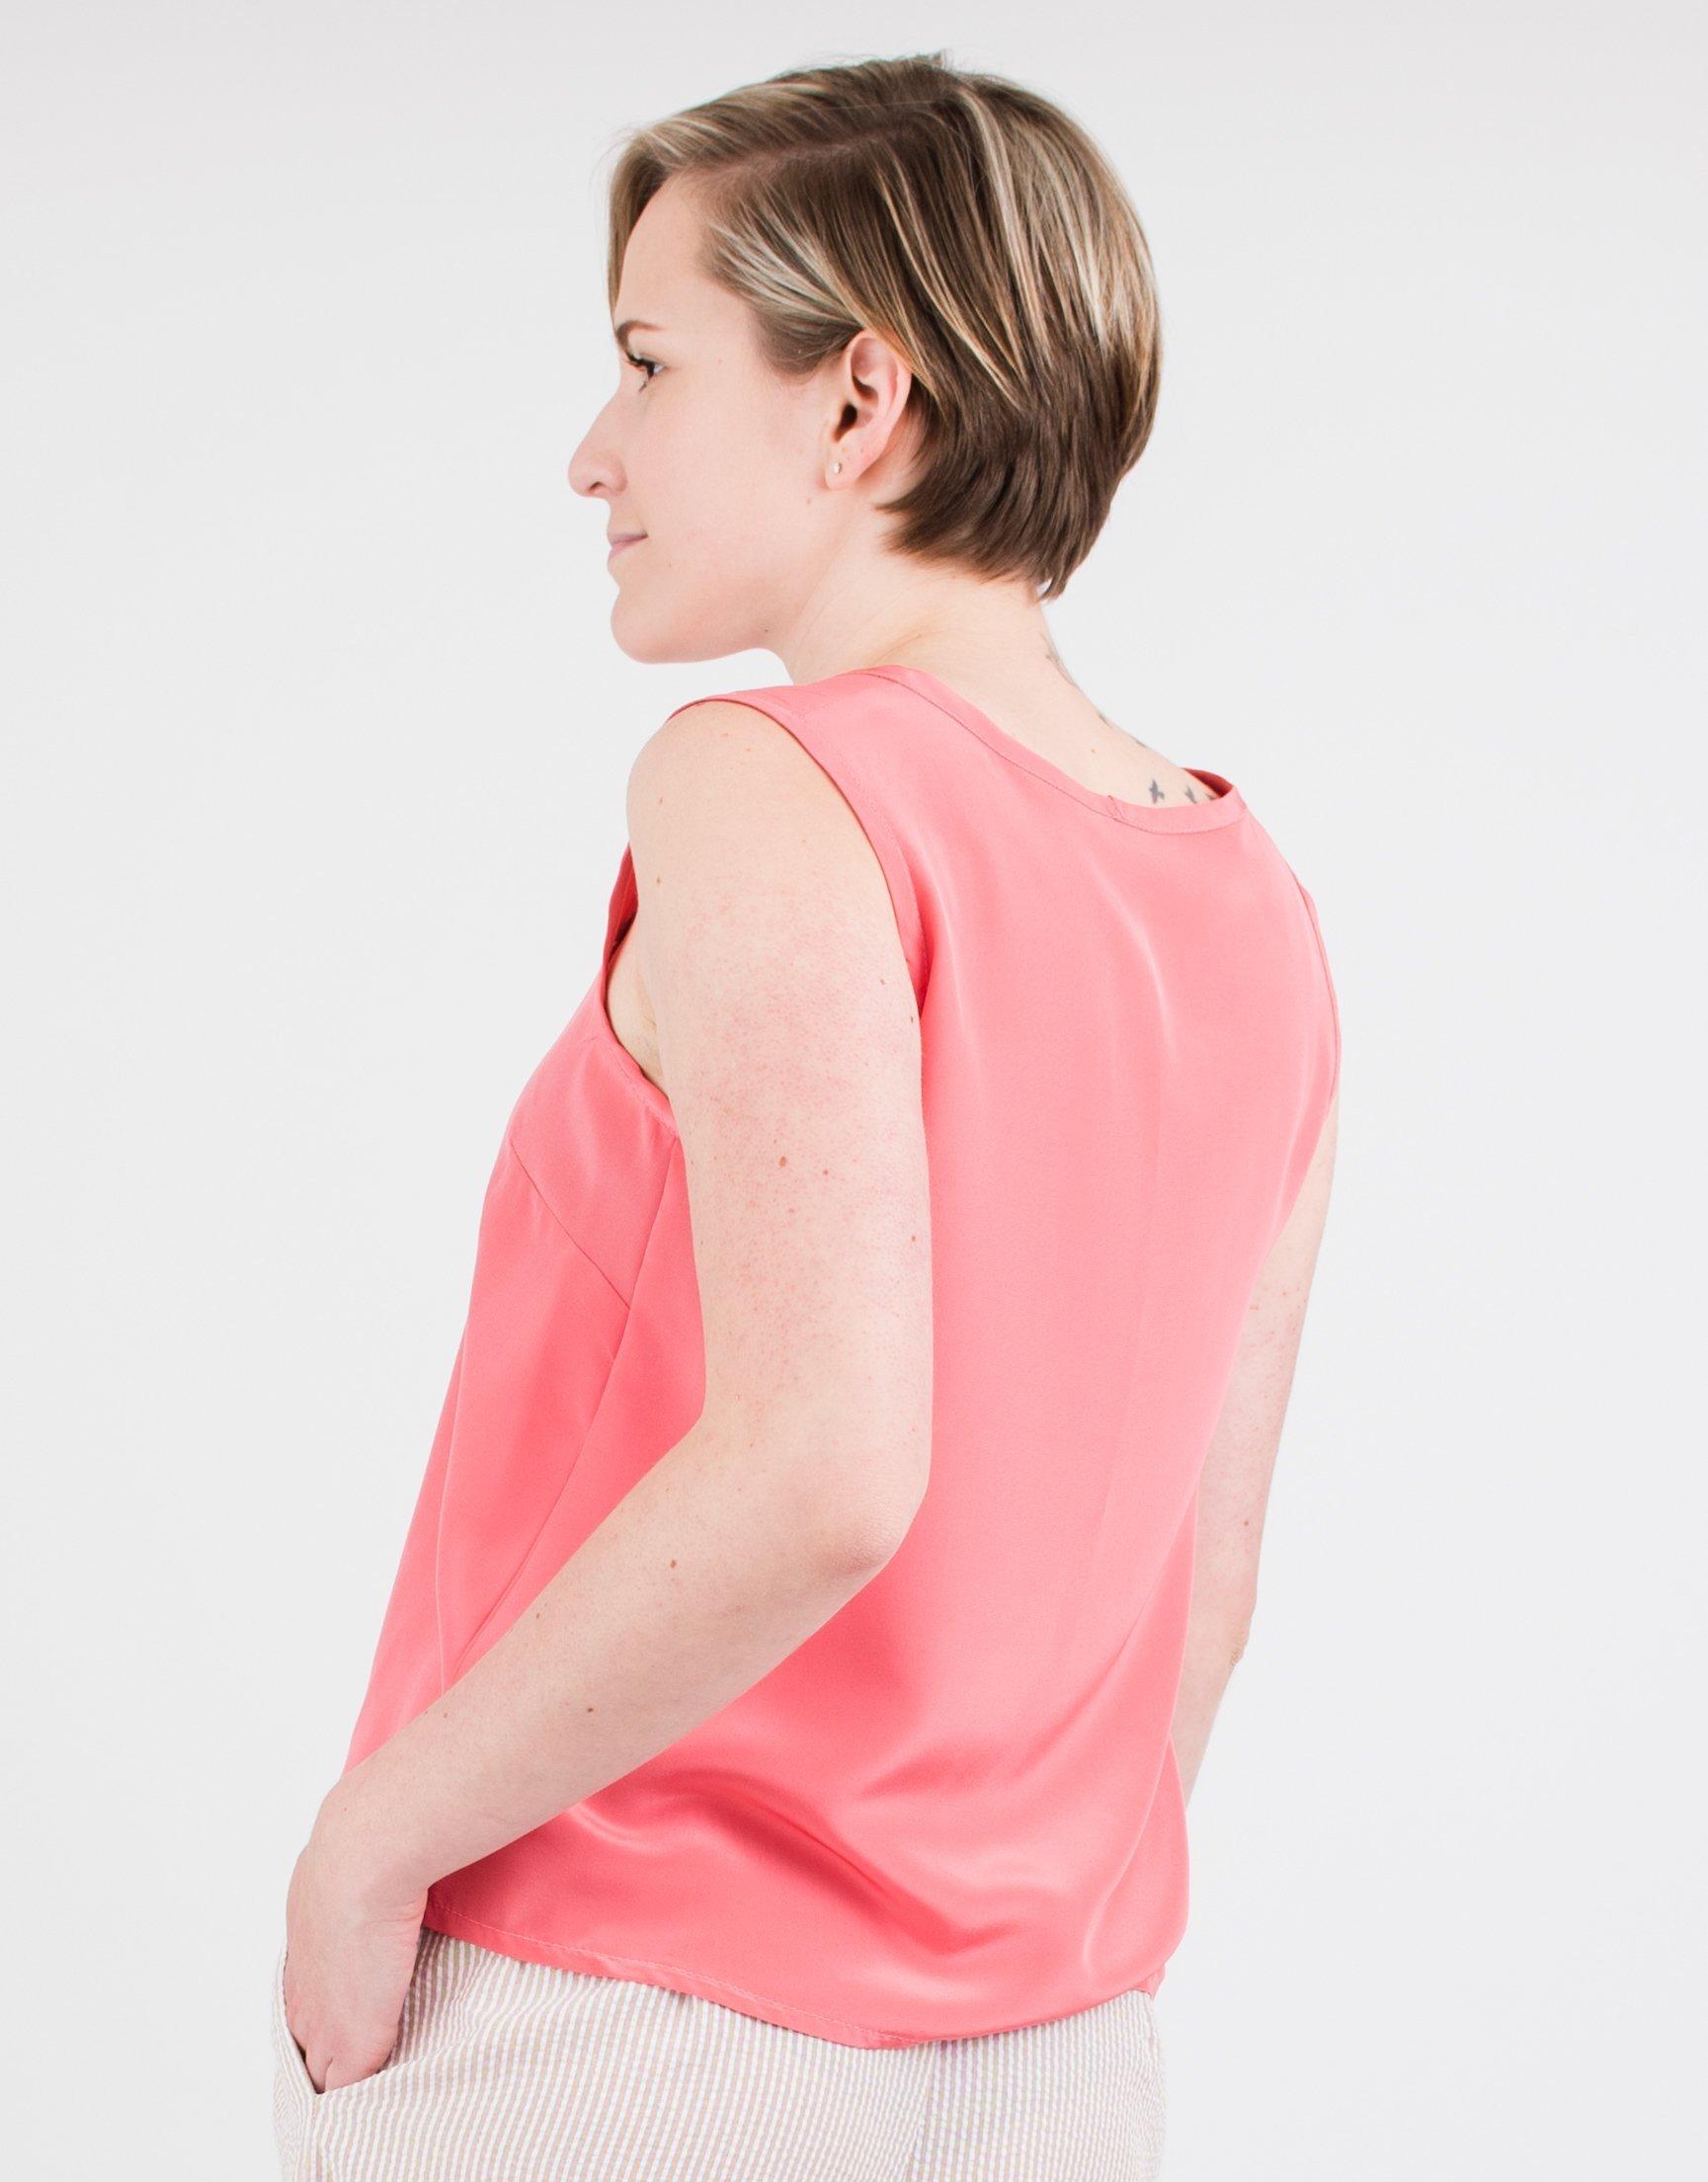 Women's Sleeveless Pink Salmon Silk Top by BAUH designs